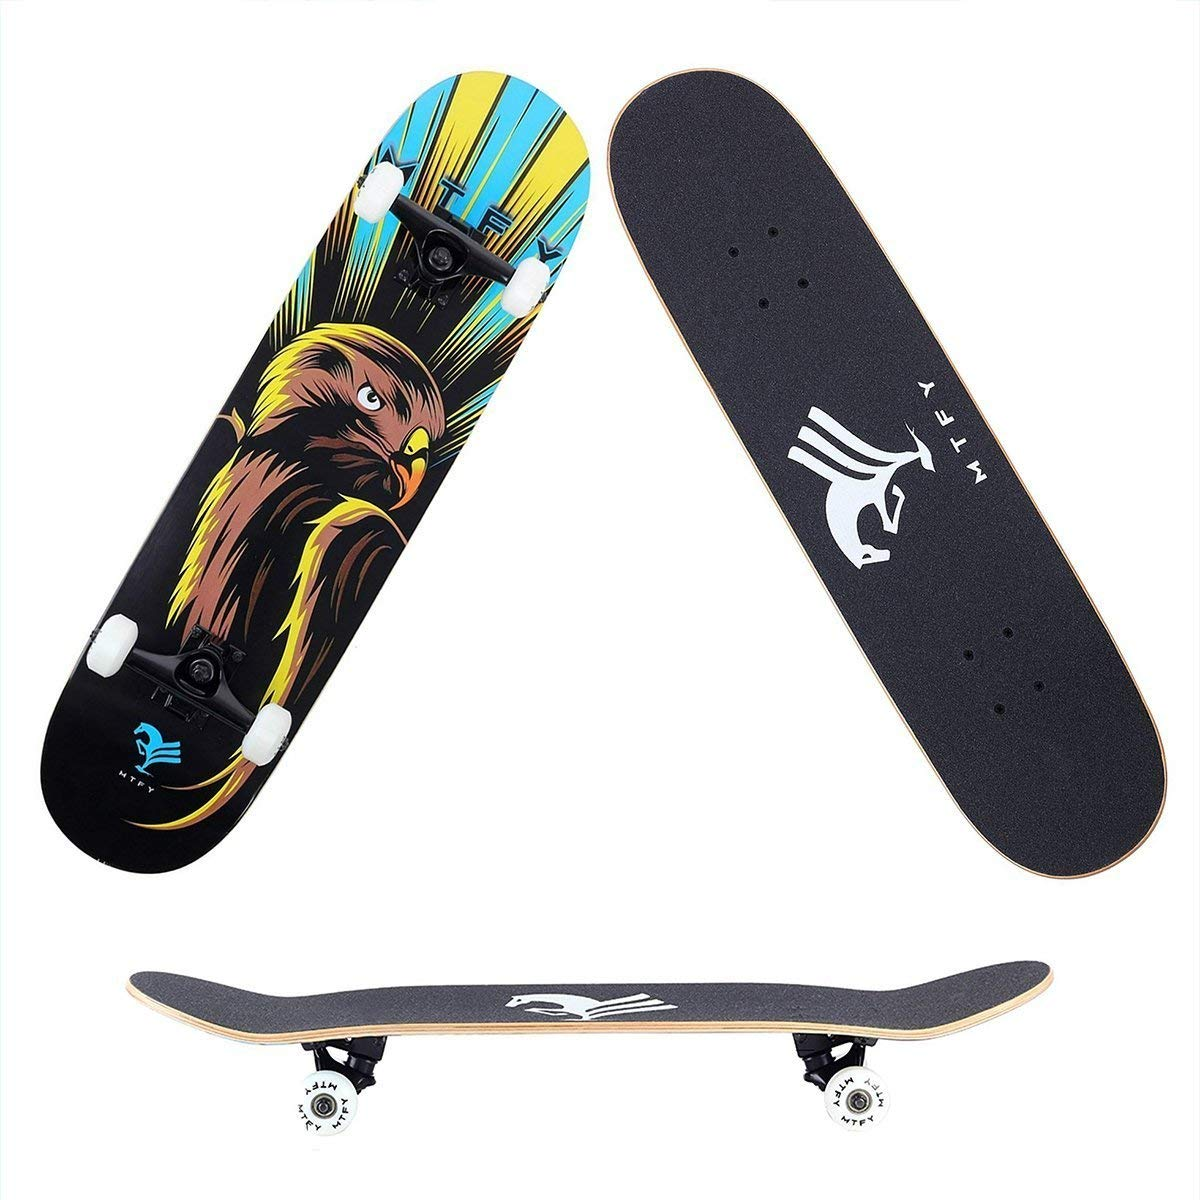 8ad9aaffed Cheap Canadian Online Skateboard Shop, find Canadian Online ...